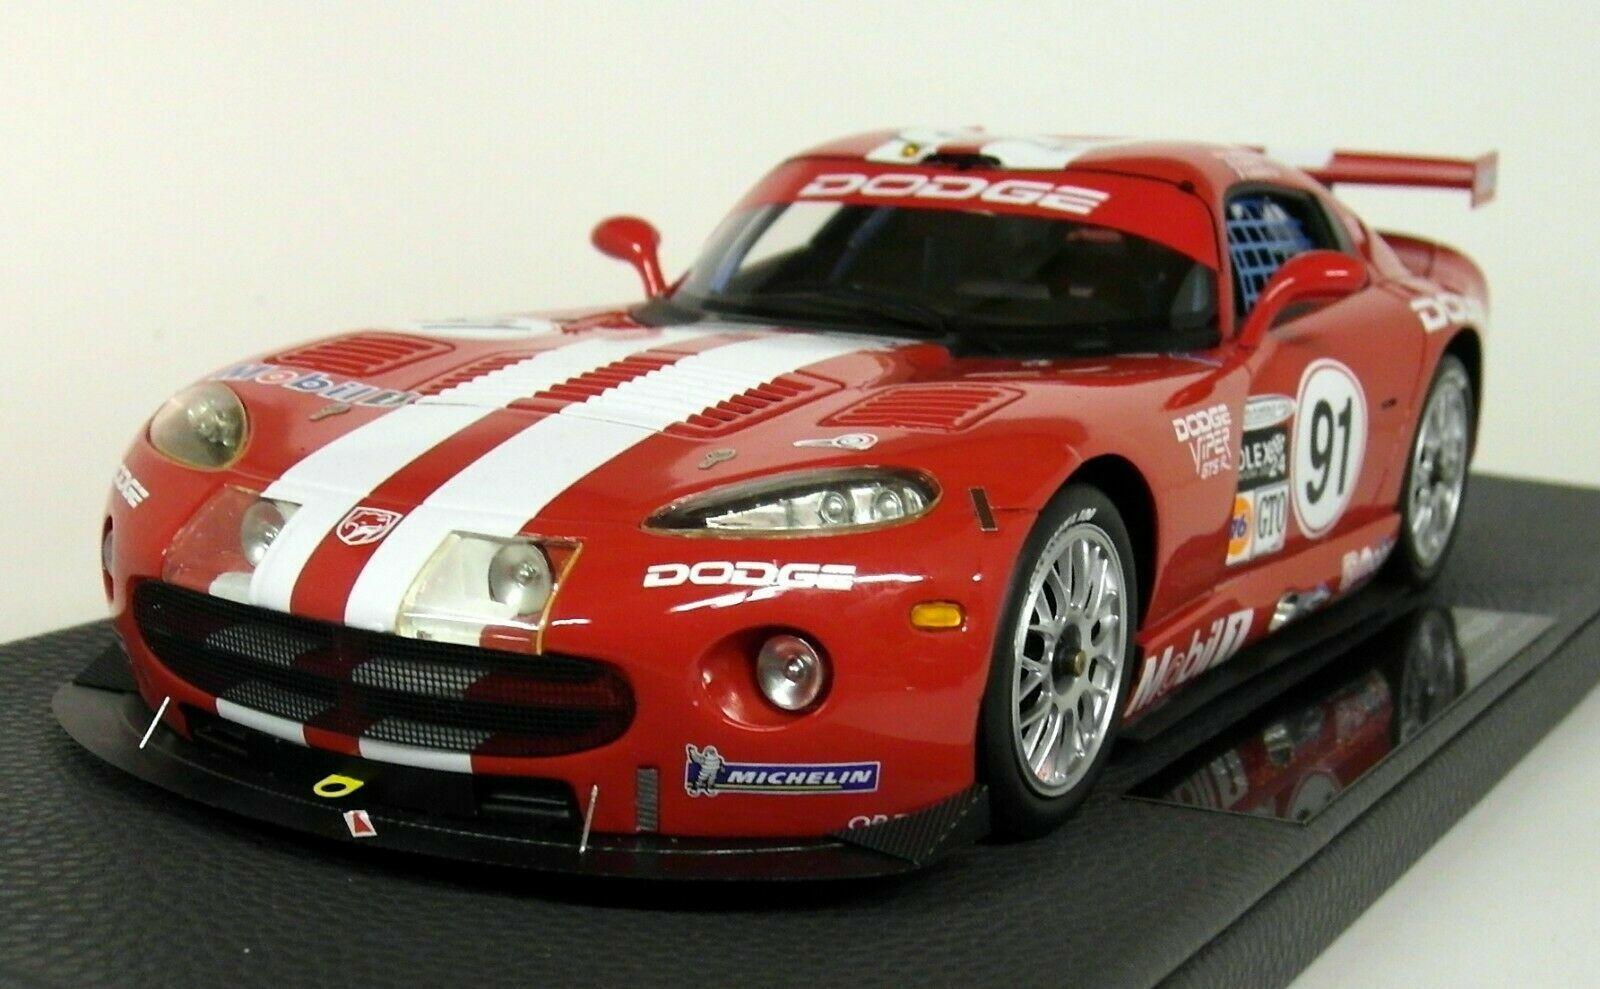 Top Marques 42B 1 18 Scale Dodge Chrysler Viper GTS-R Oreca Daytona Winner 2000